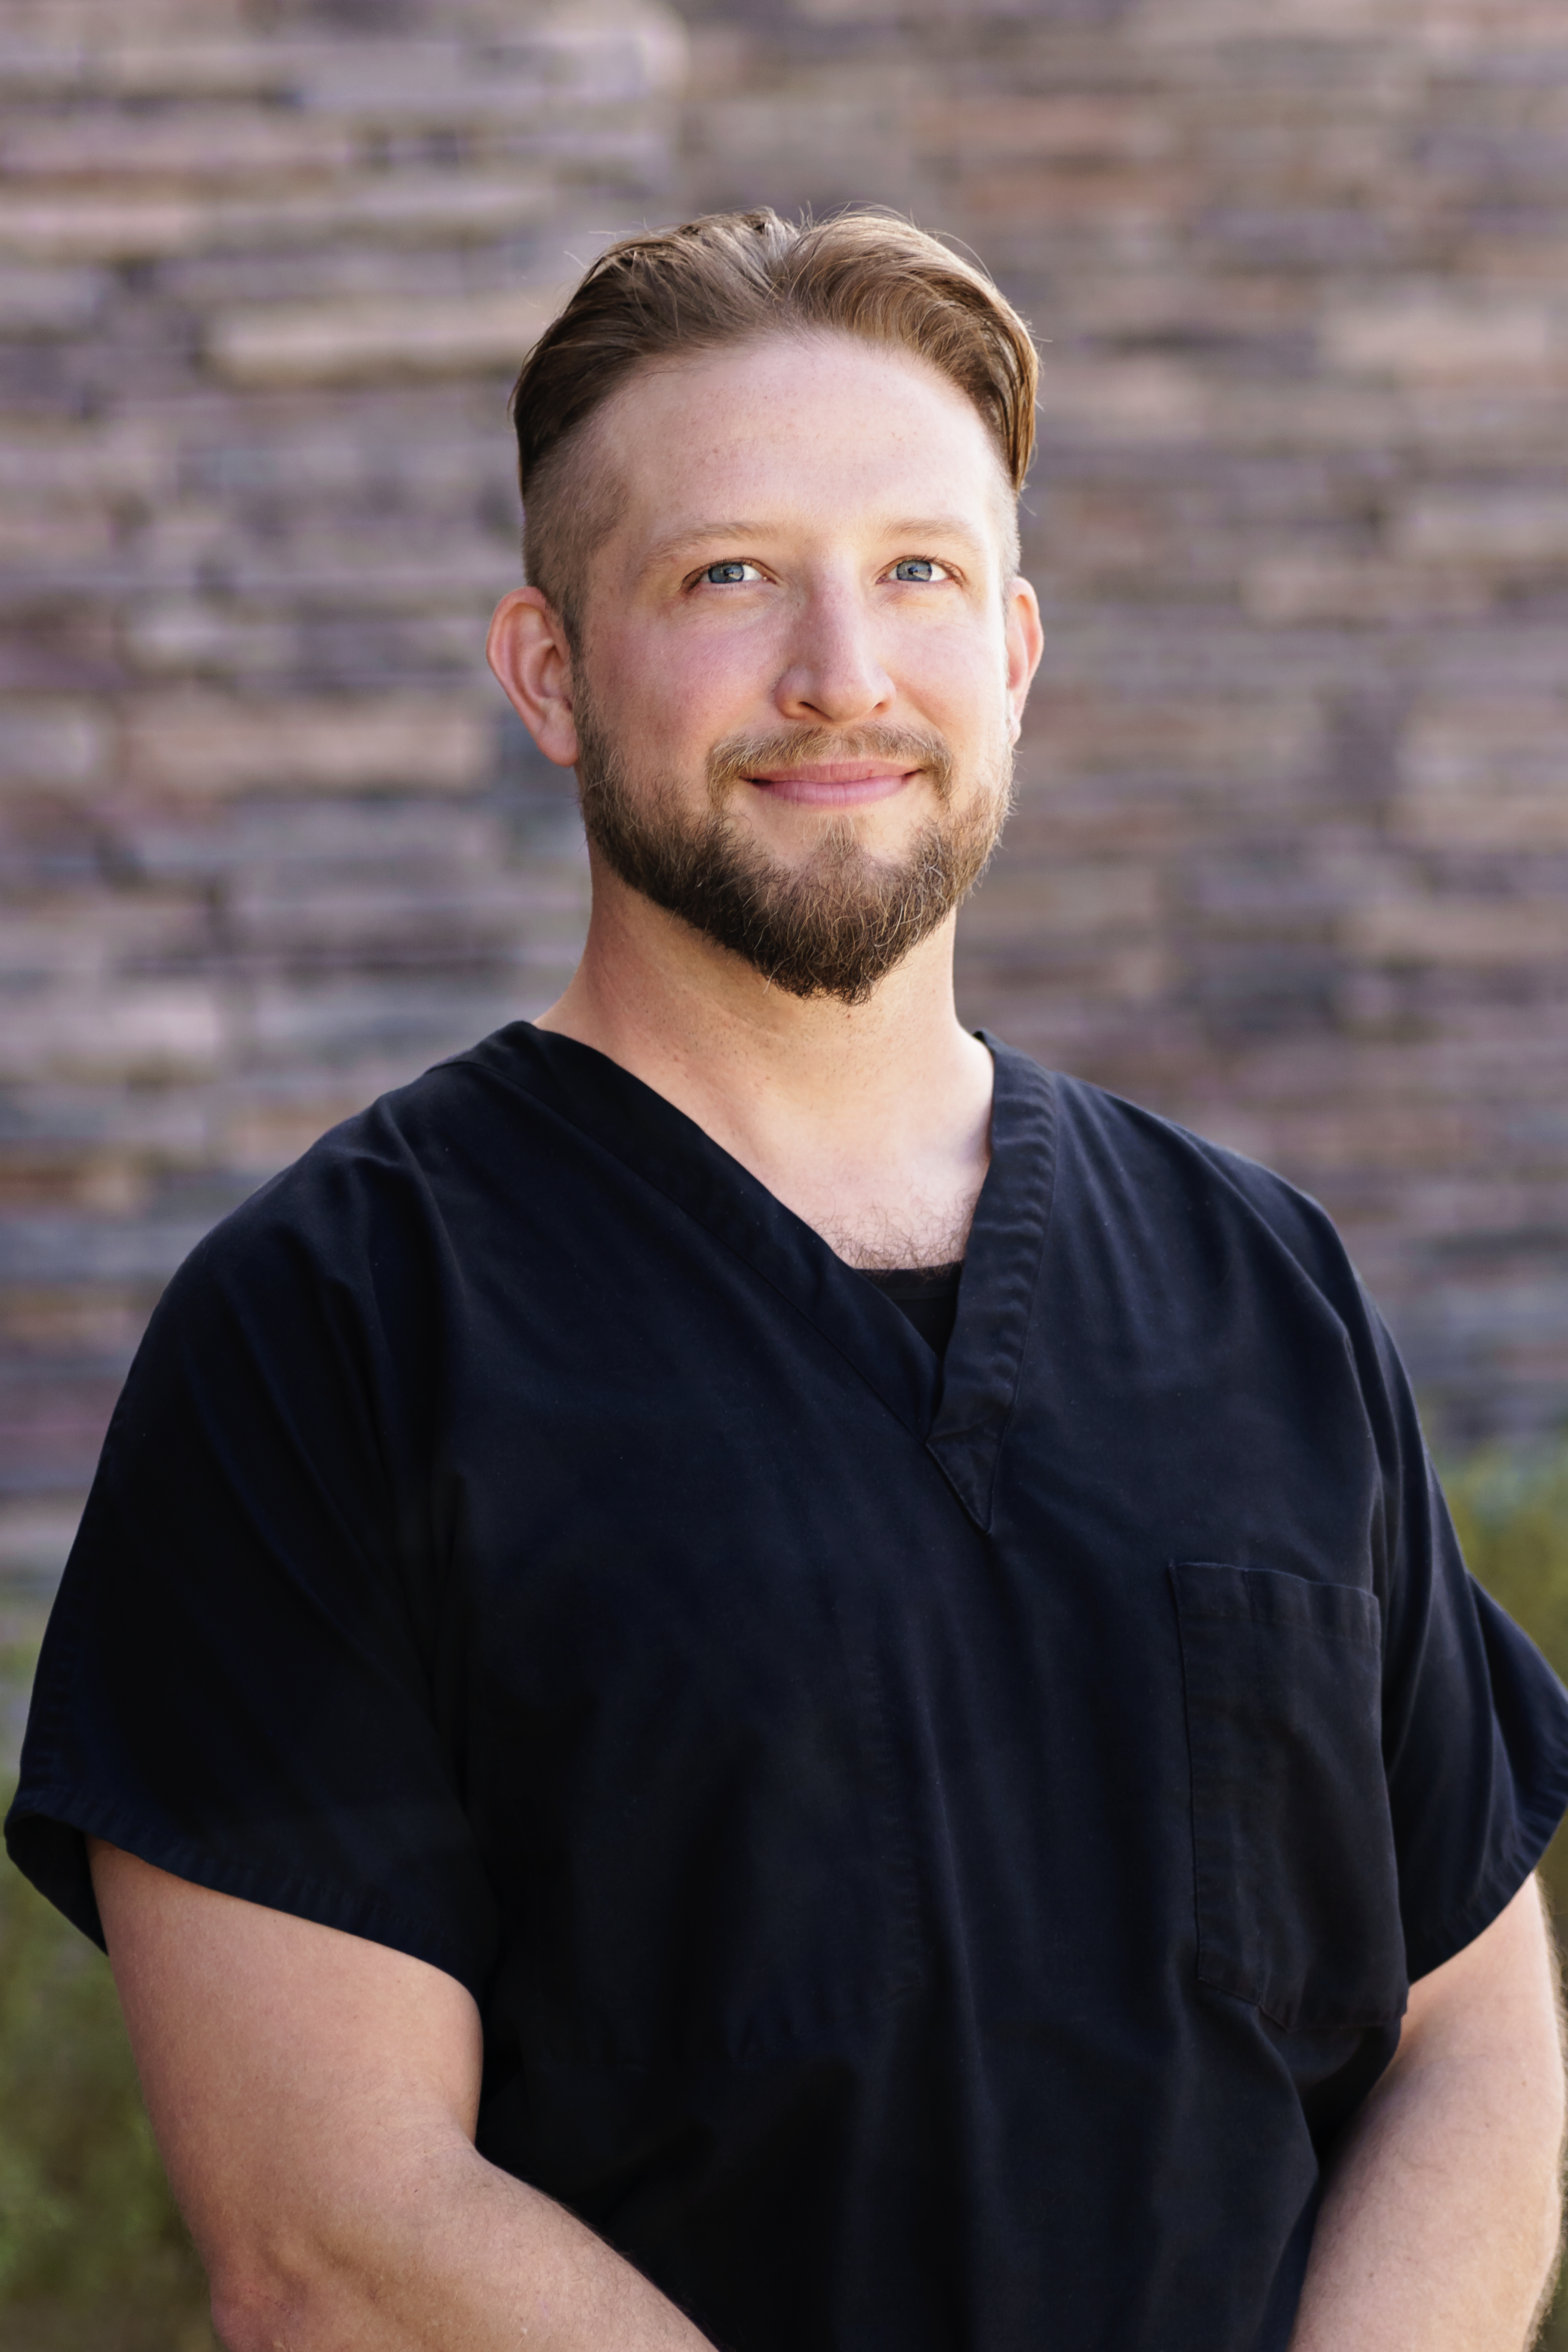 Aaron W. LaTowsky MD